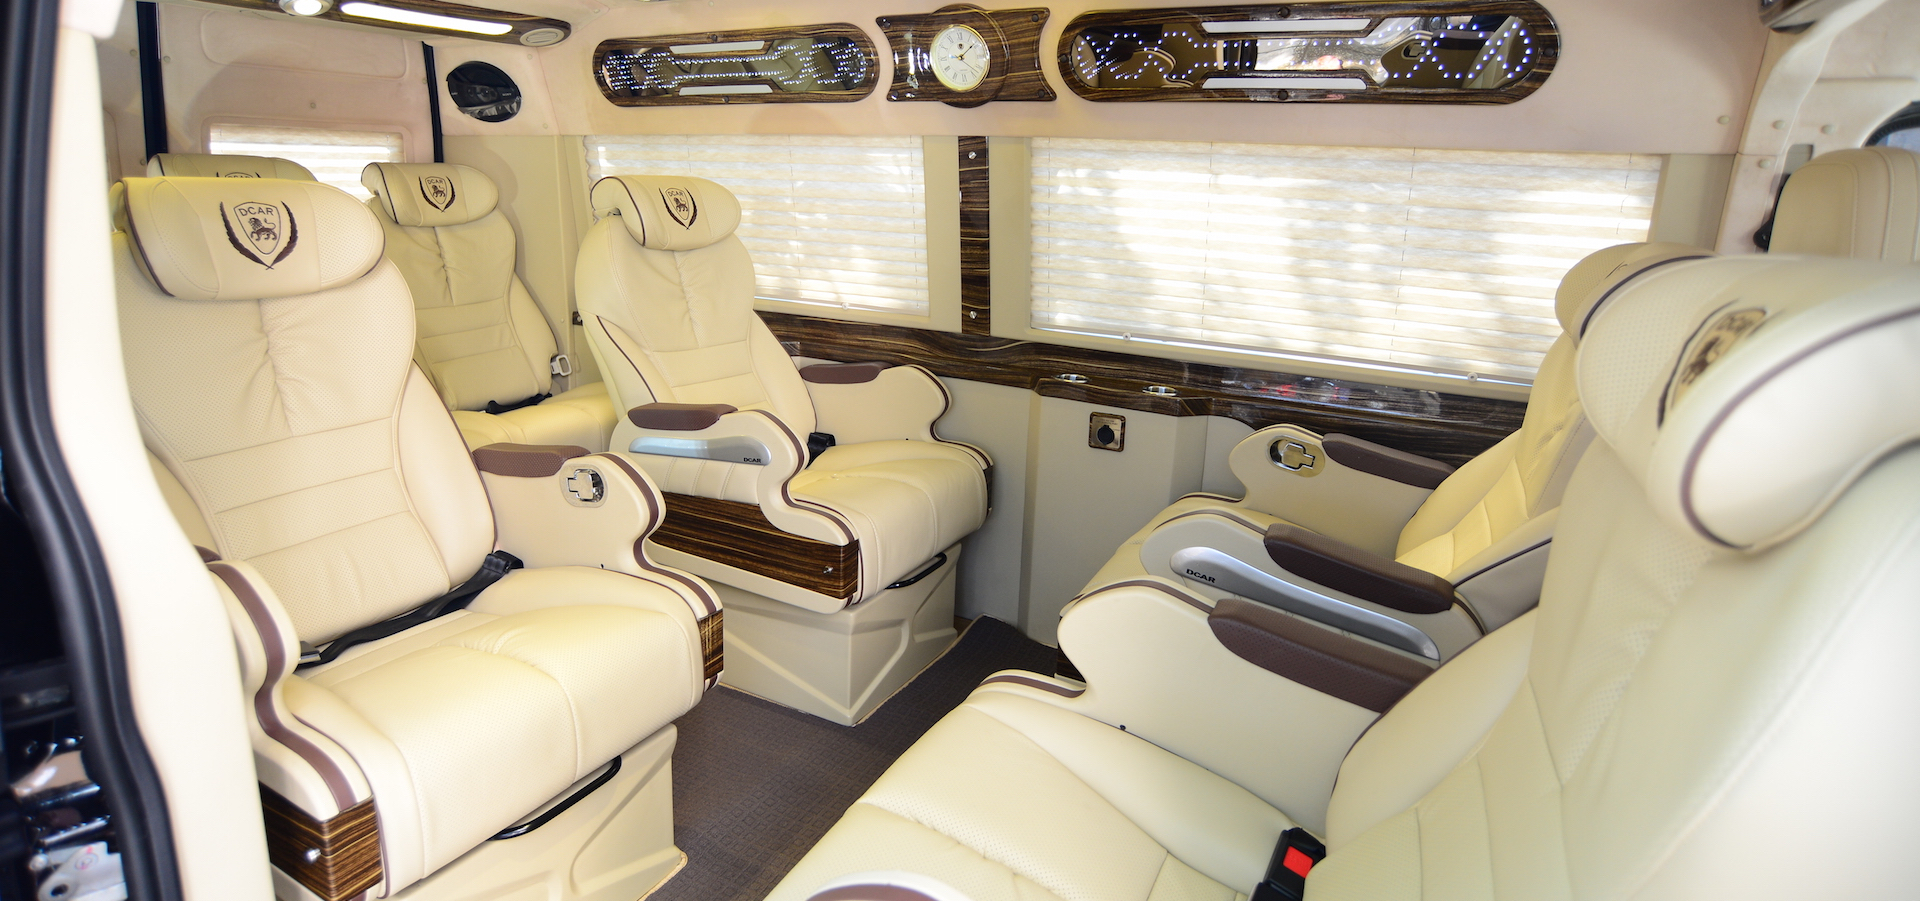 Ford Transit Dcar Limousine 2021 (Bản 10 chỗ)3